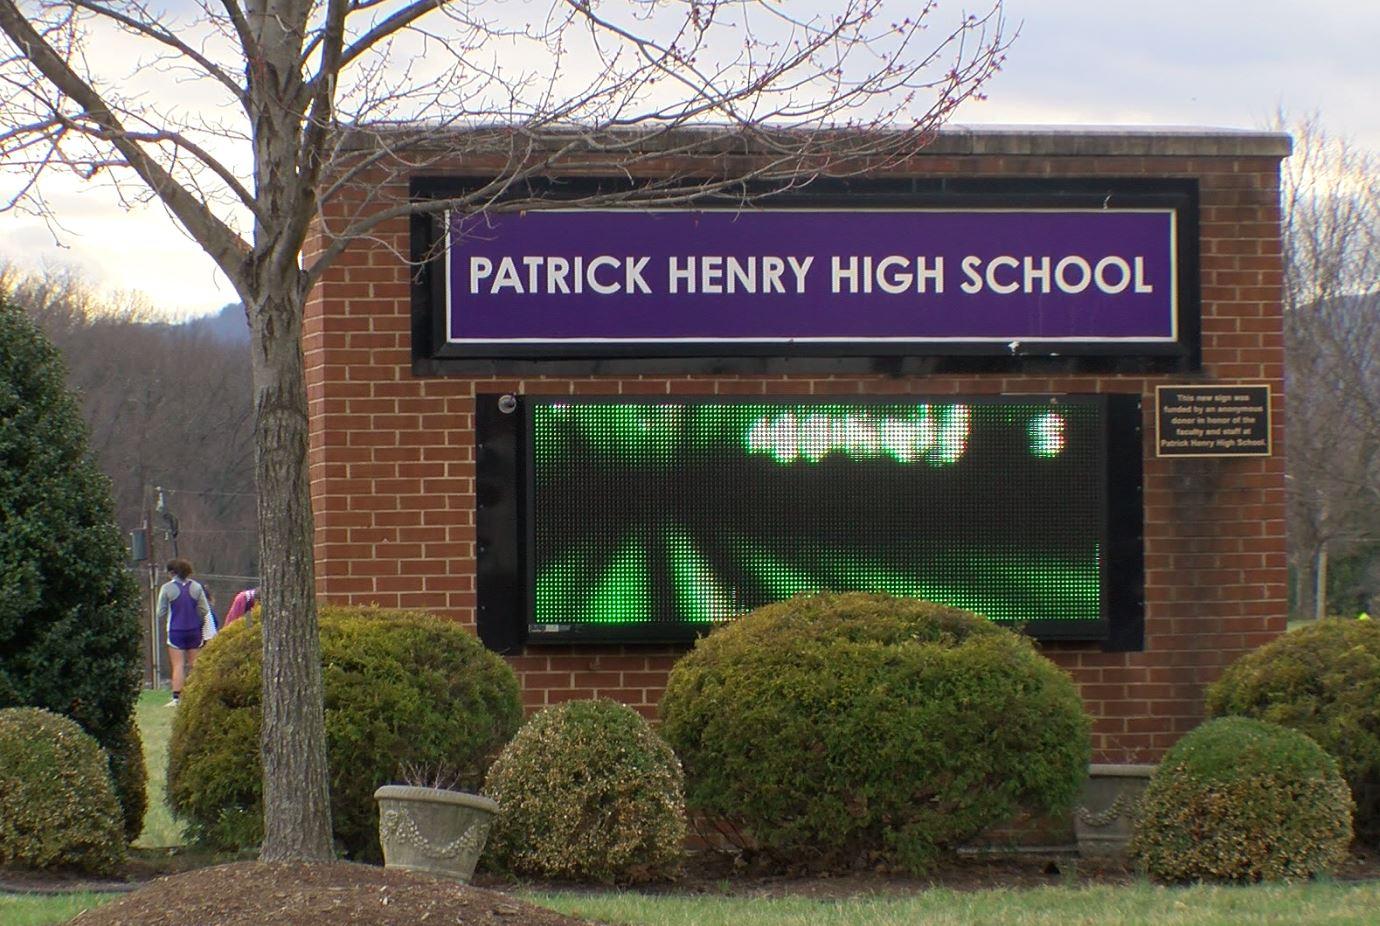 patrick henry high school_1539811016893.JPG.jpg